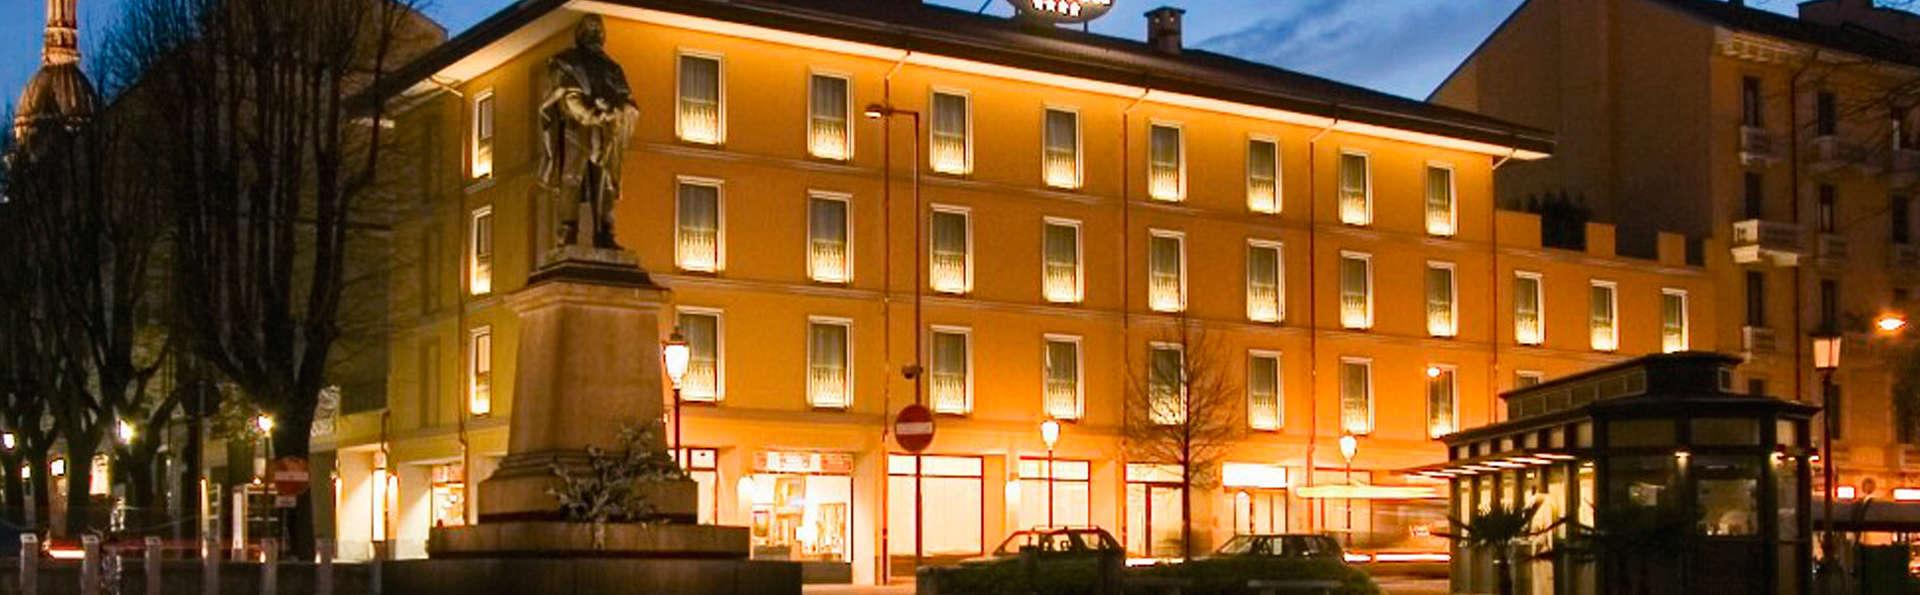 Hotel Cavour - EDIT_front1.jpg